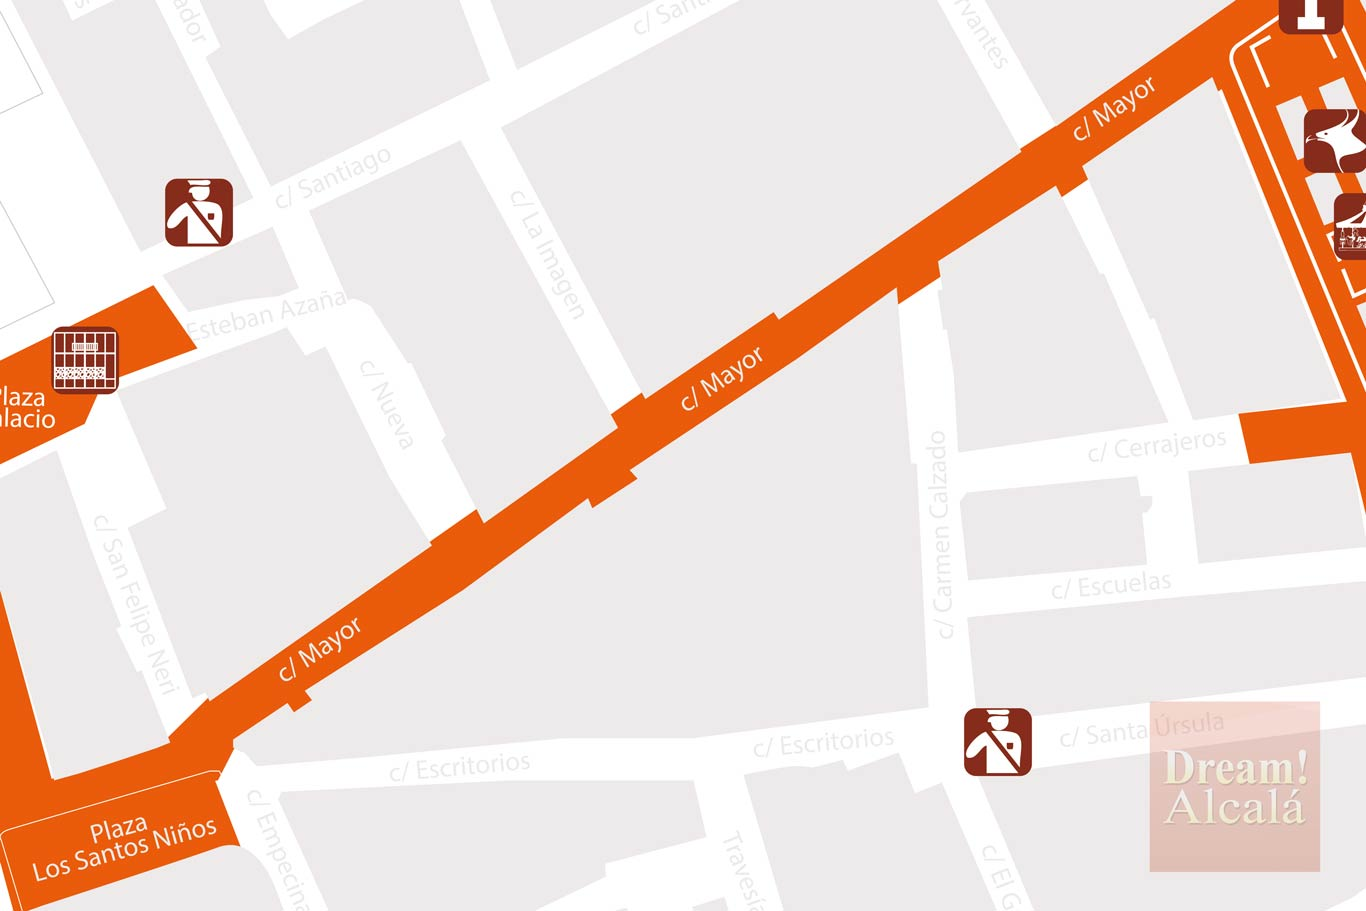 Plano Mercado Cervantino 2017 de Alcalá de Henares